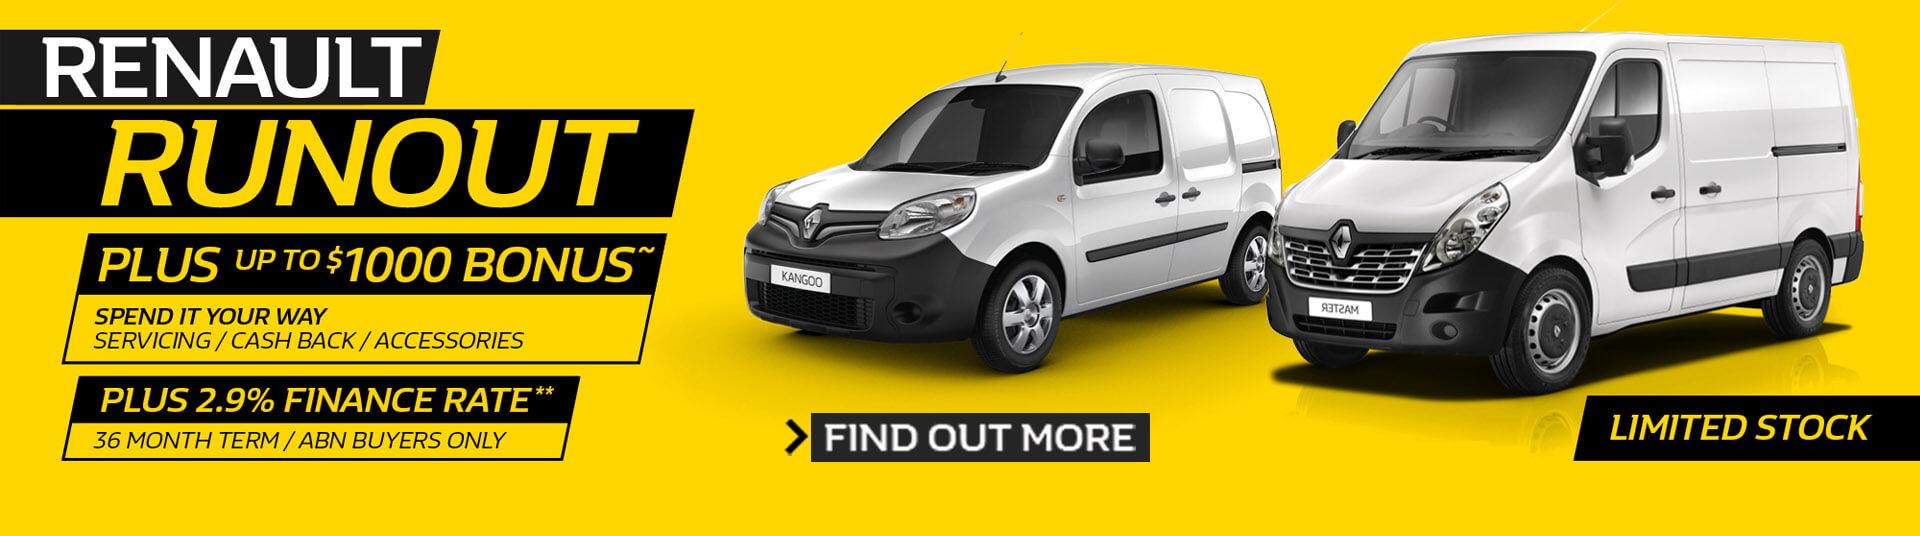 Renault Offers - Dec 2019